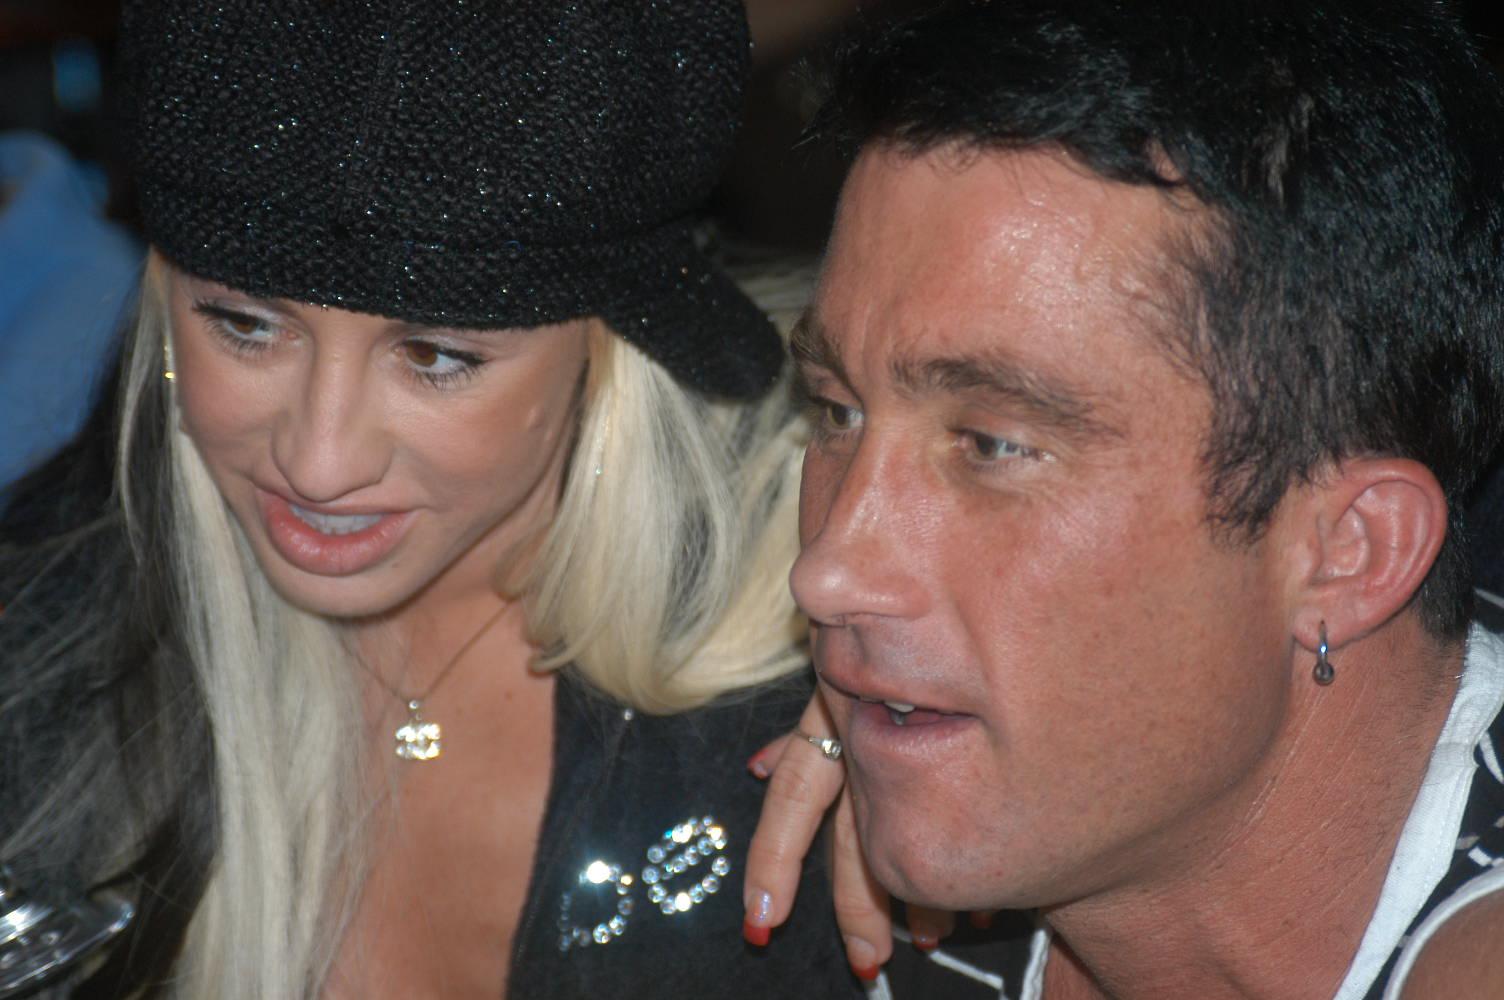 File:Davia Ardell, Billy Glide at Porn Star Karaoke 1.jpg